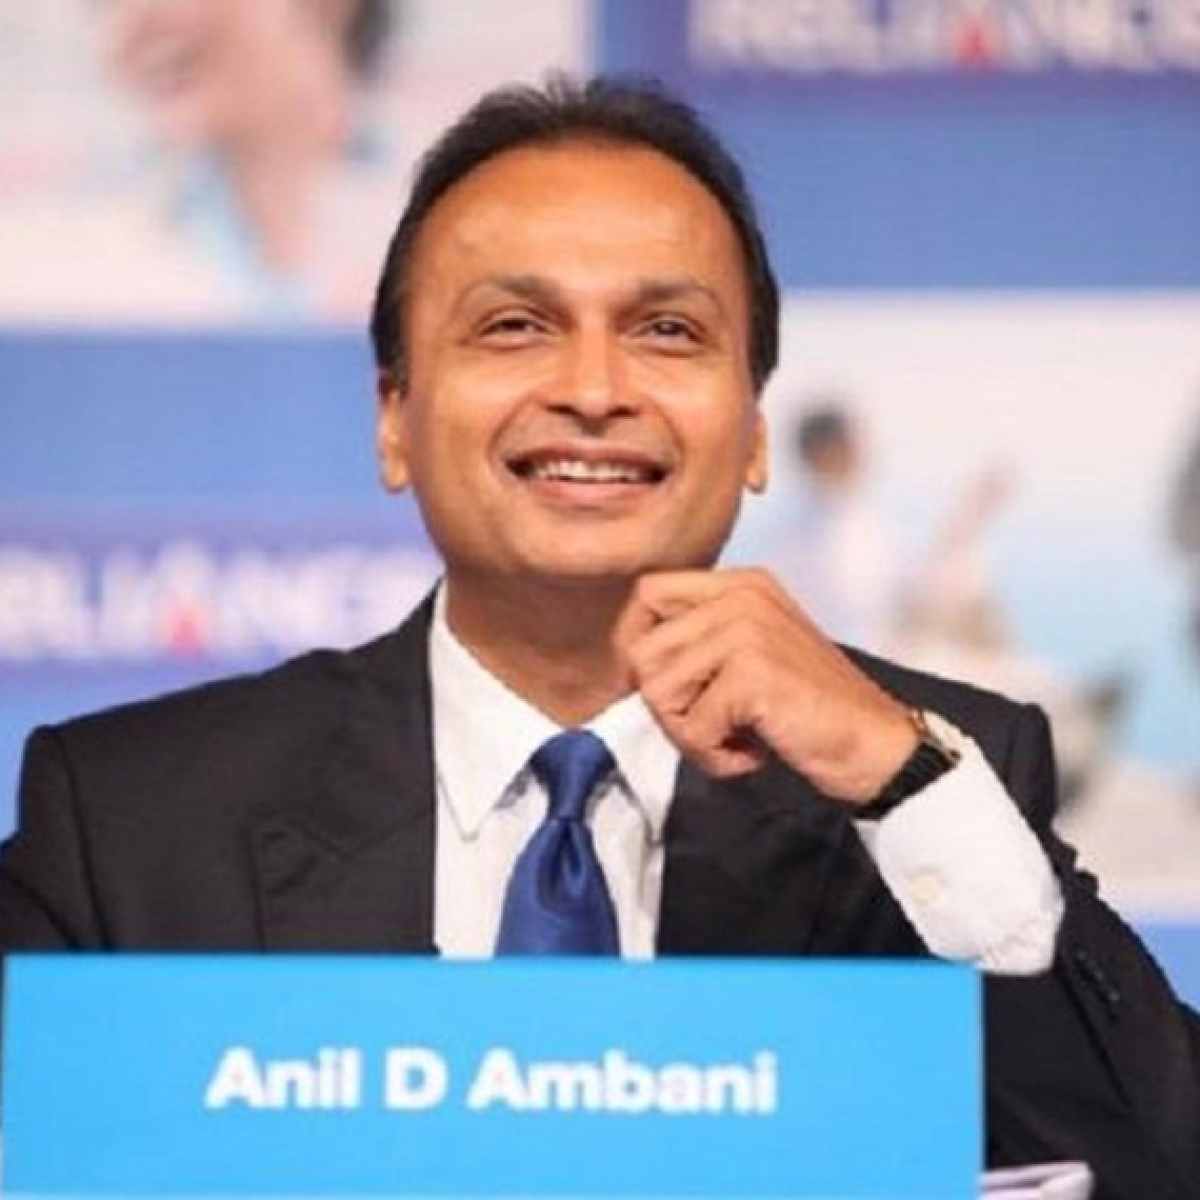 Anil Ambani-led Reliance Group's market capitalisation surges 1000% to nearly Rs 8000 crore